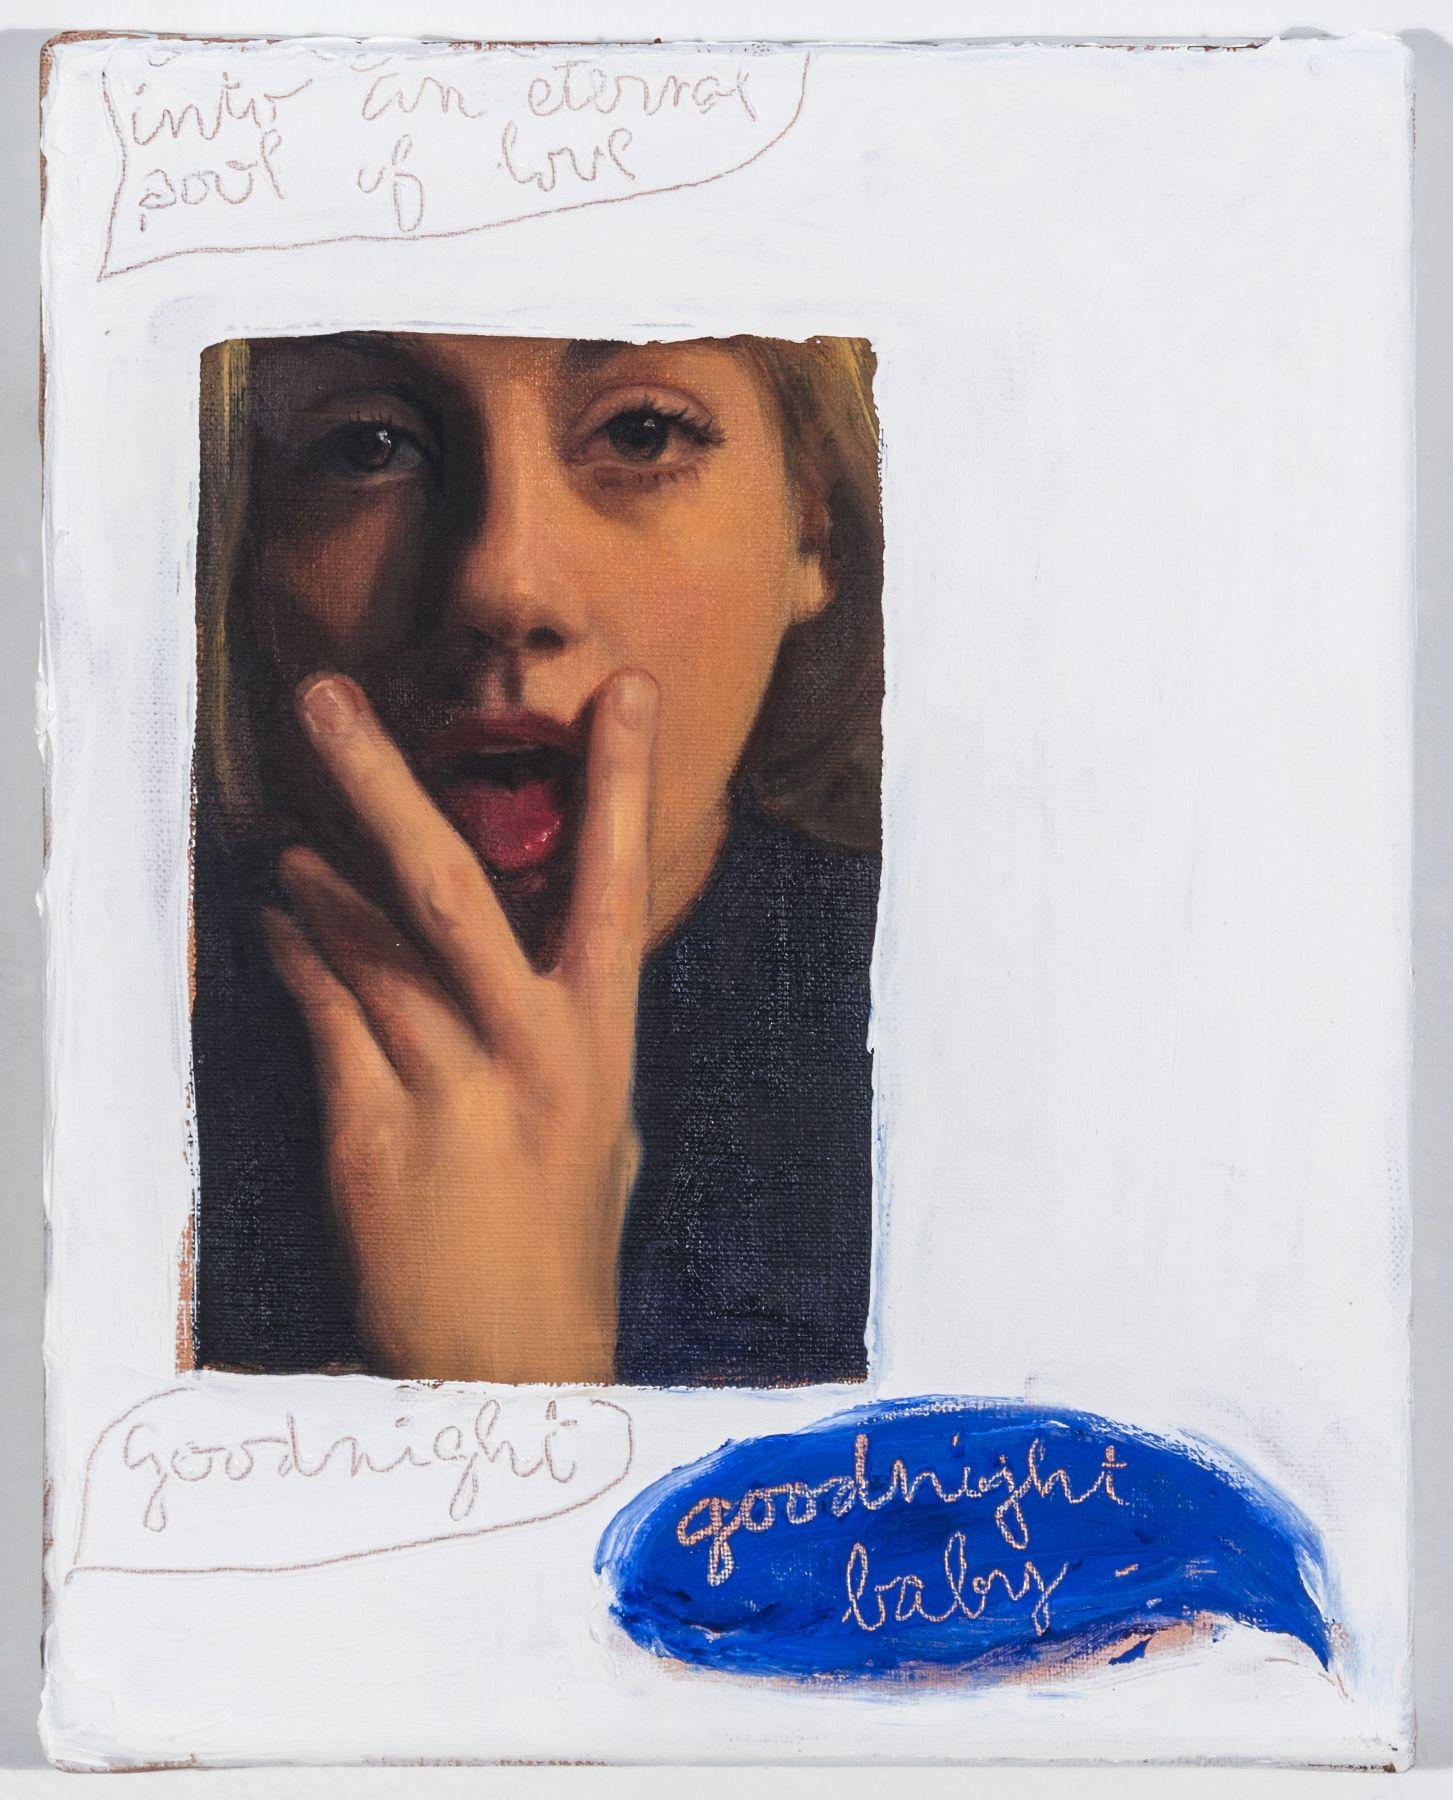 Jenna Gribbon, -goodnight, -goodnight baby, 2018